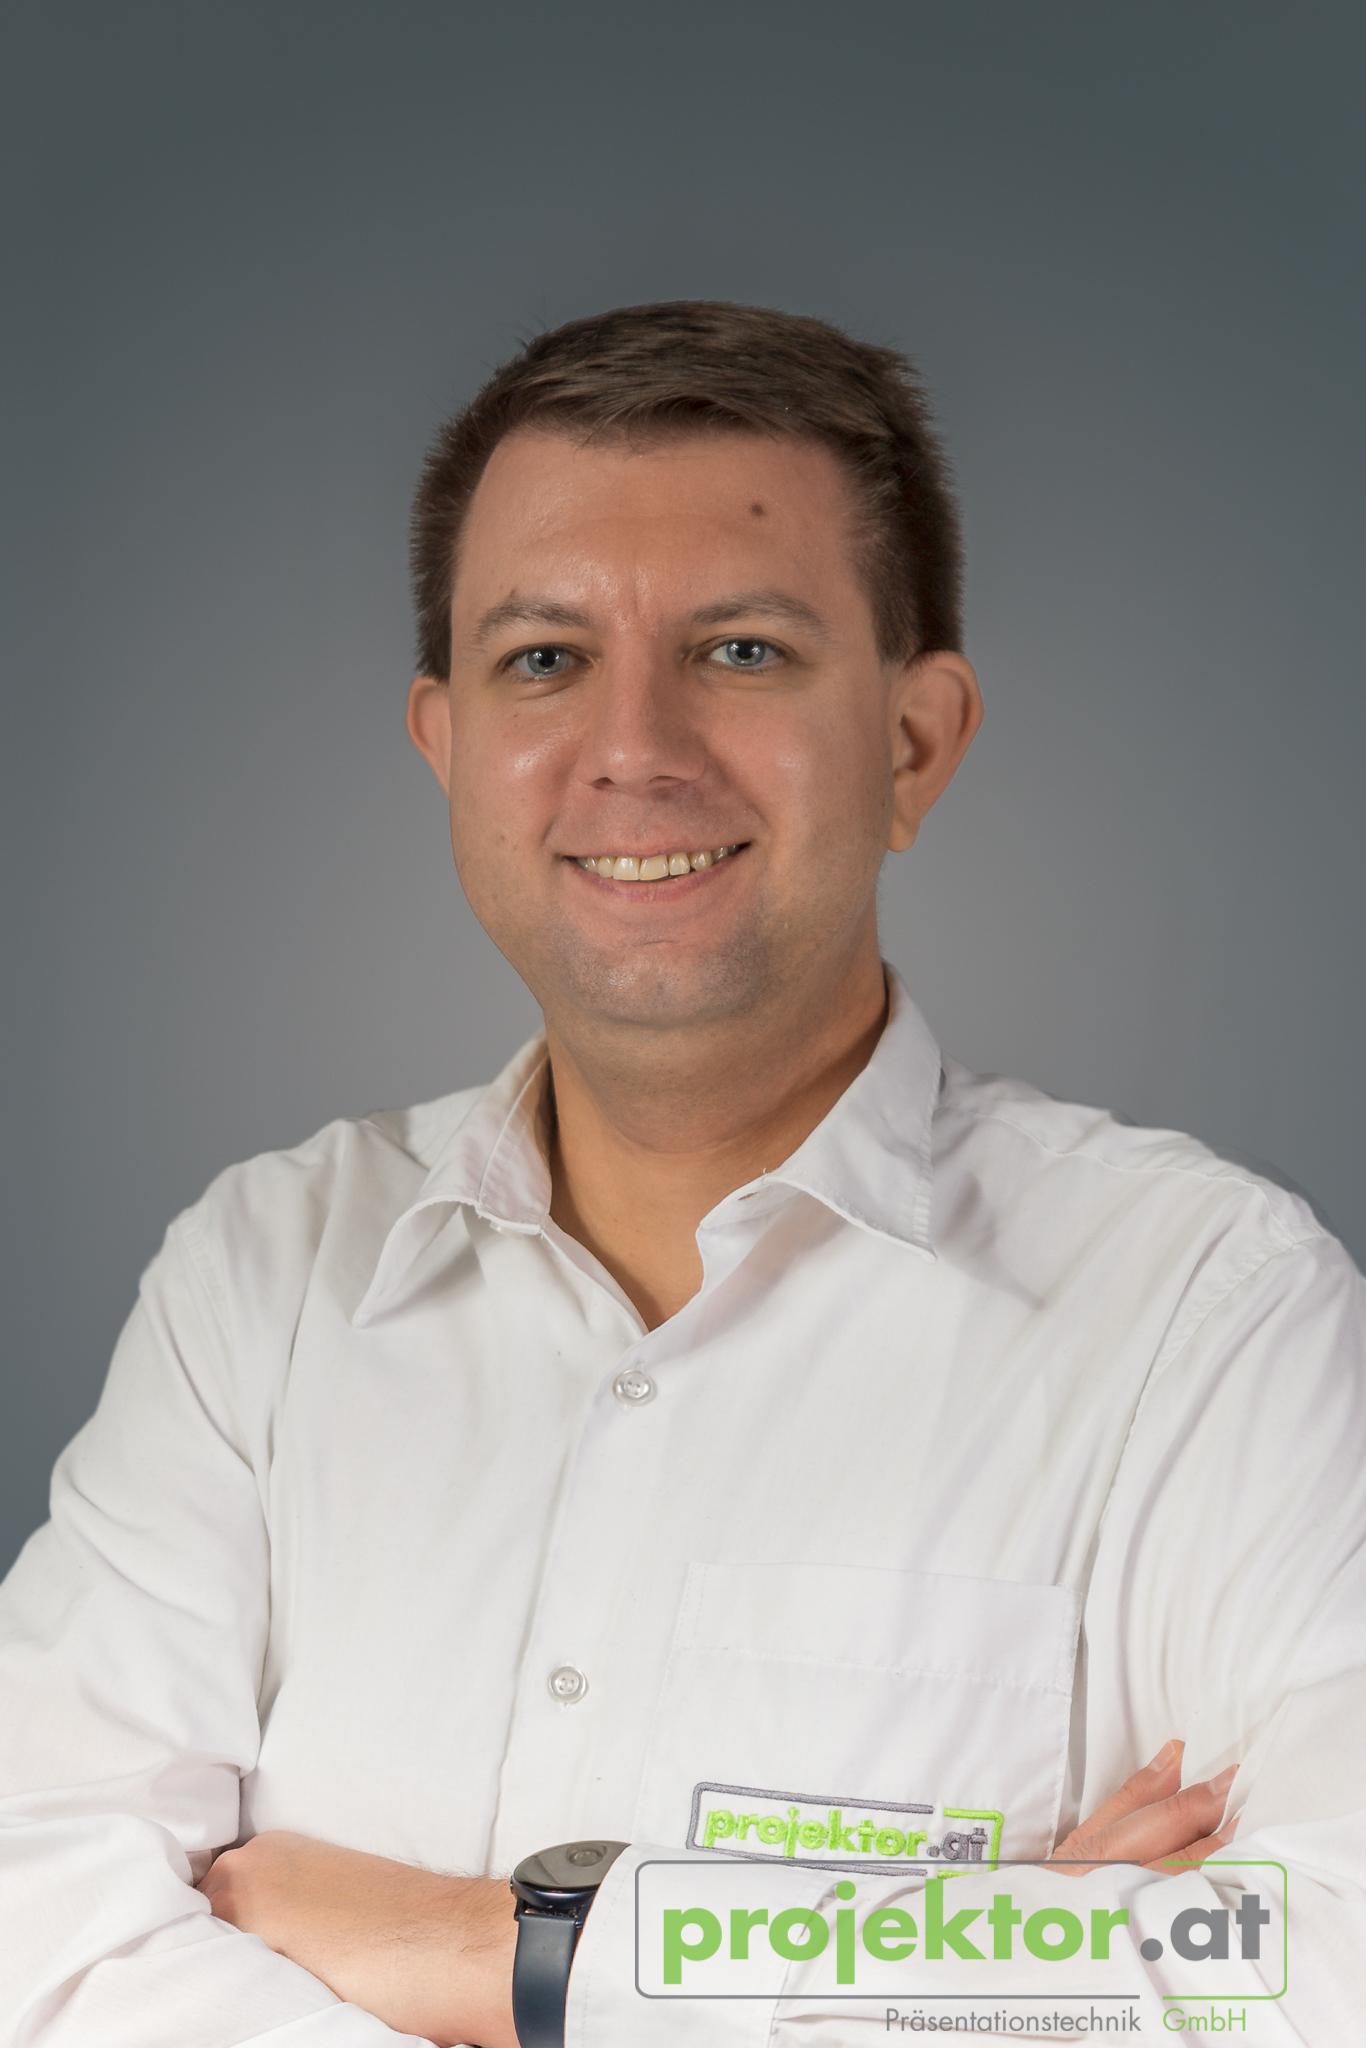 David Mooslechner